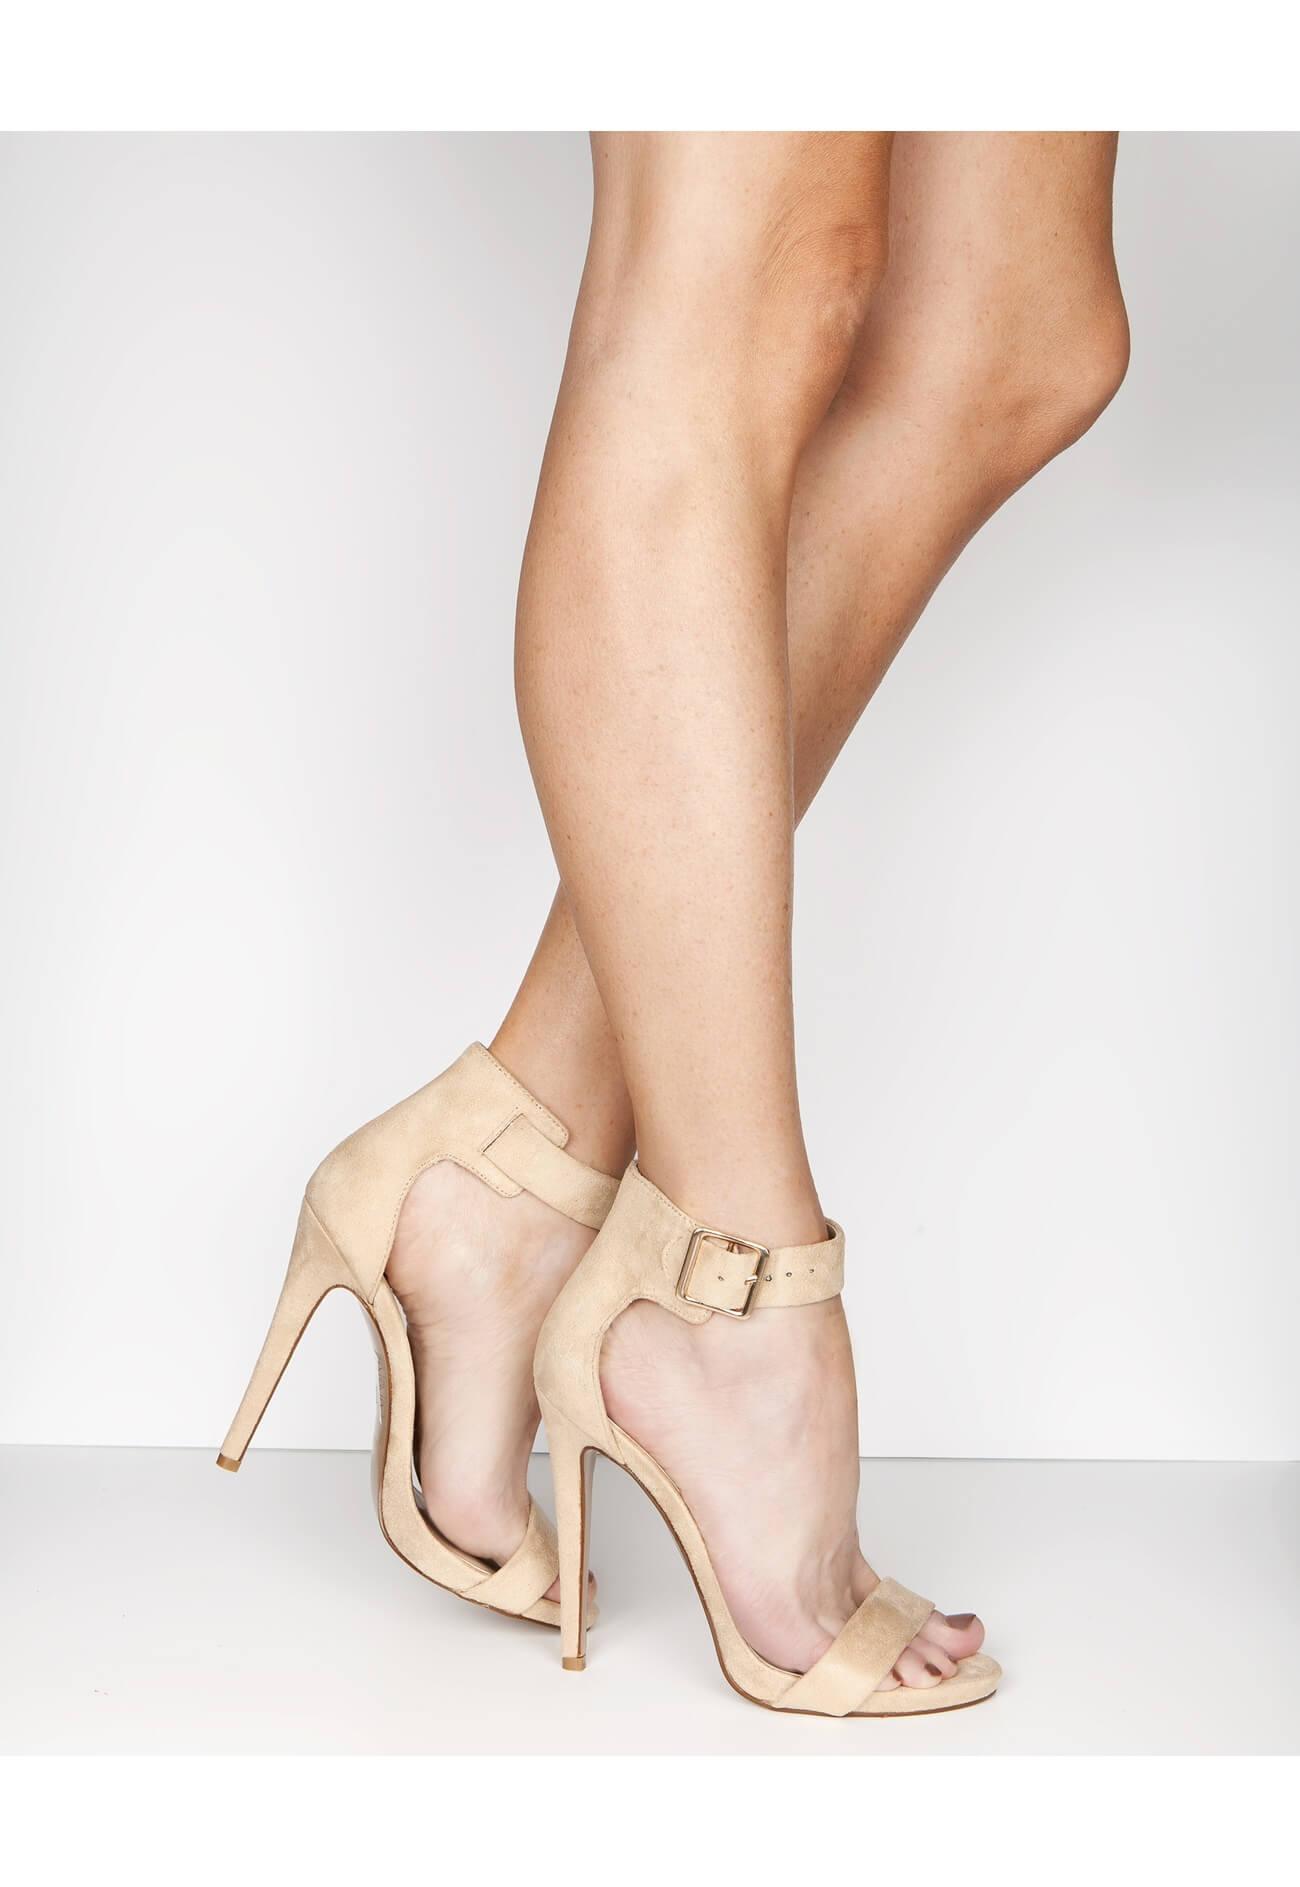 rita1truffle-sandaletter-rita1-beige-229899